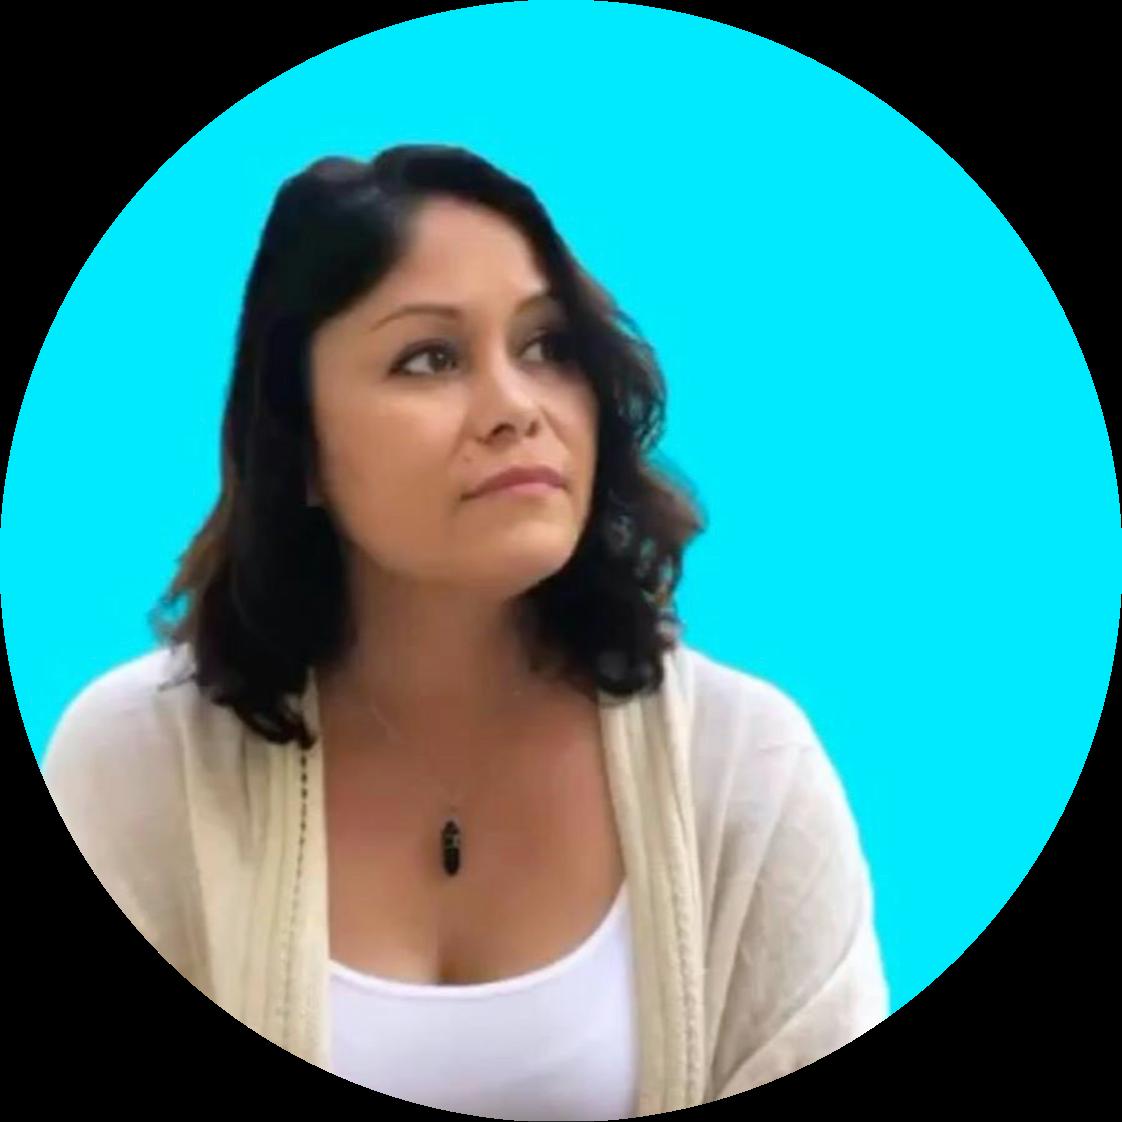 @itsmargaritareyes Profile Image | Linktree